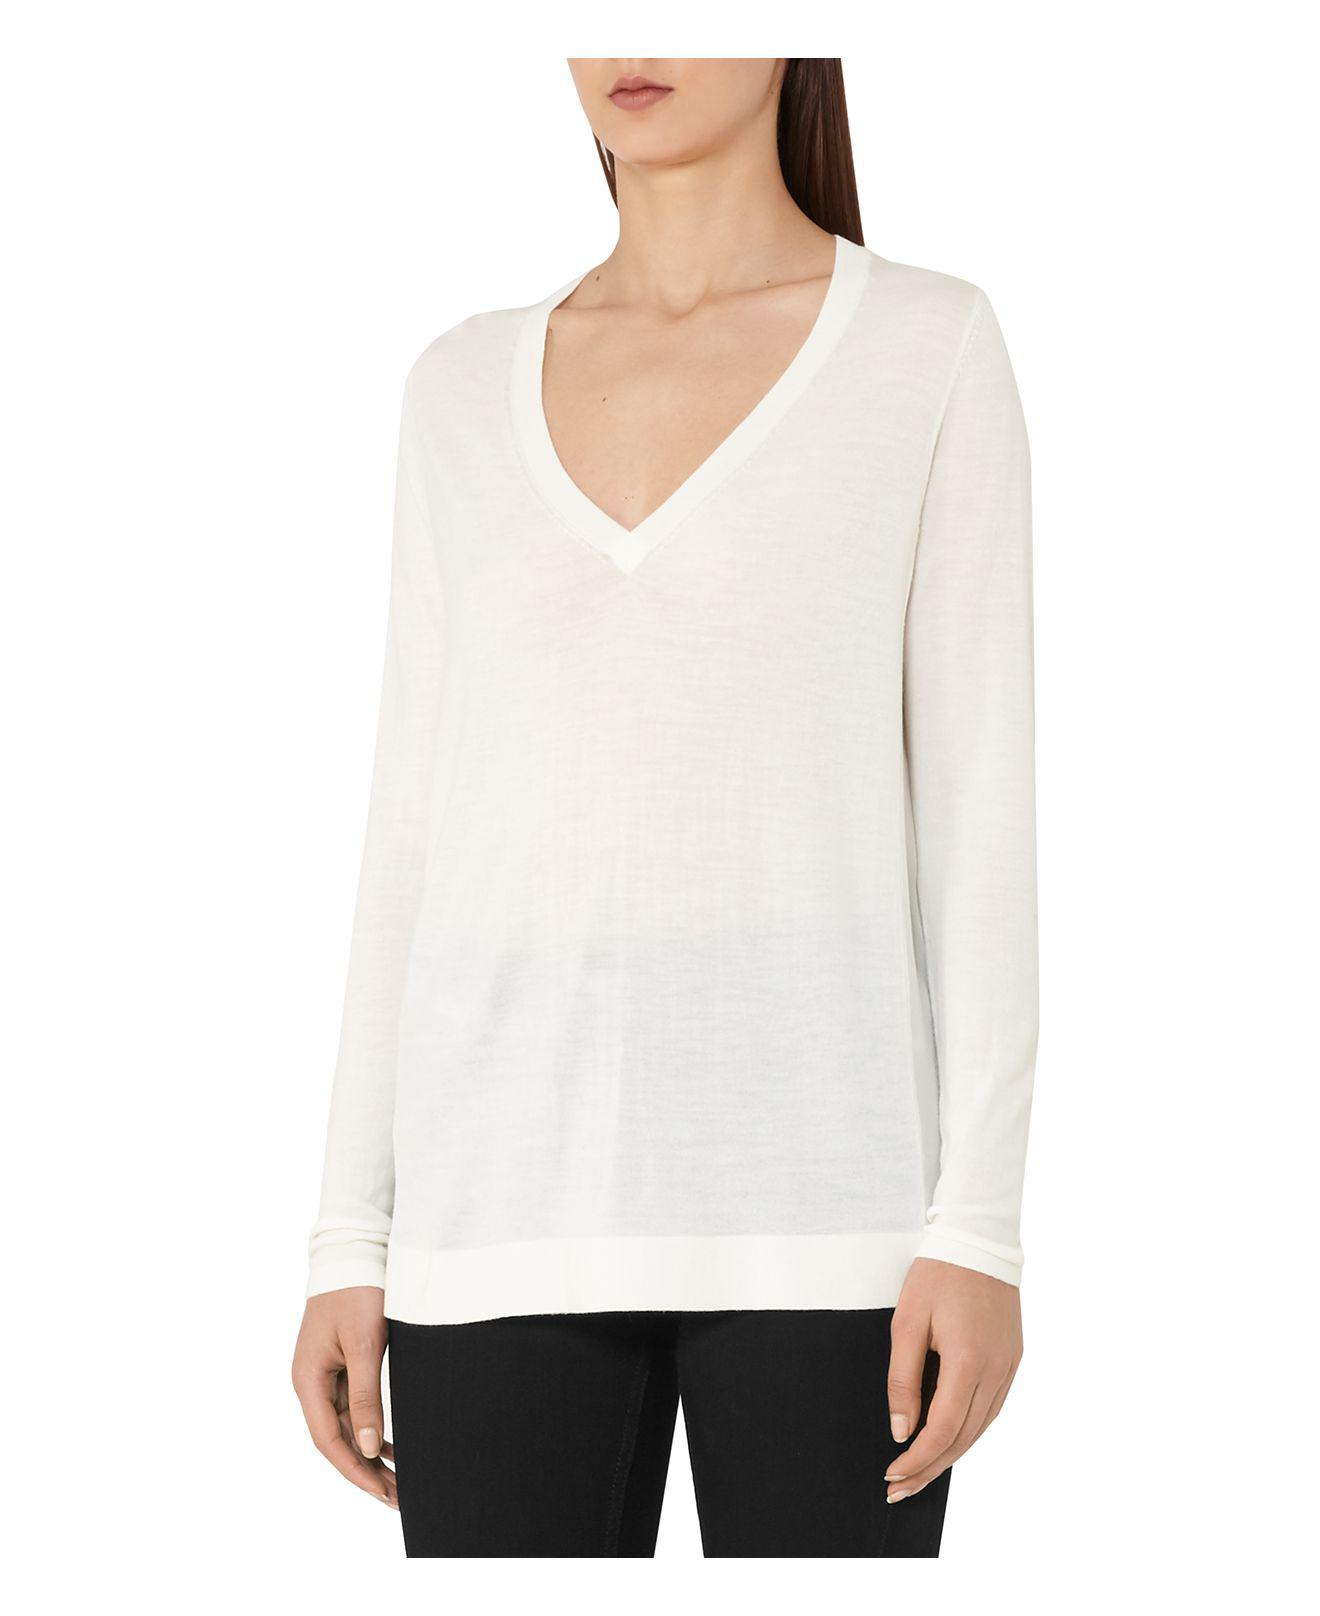 Reiss Sally Merino Wool & Silk V-neck Sweater in White